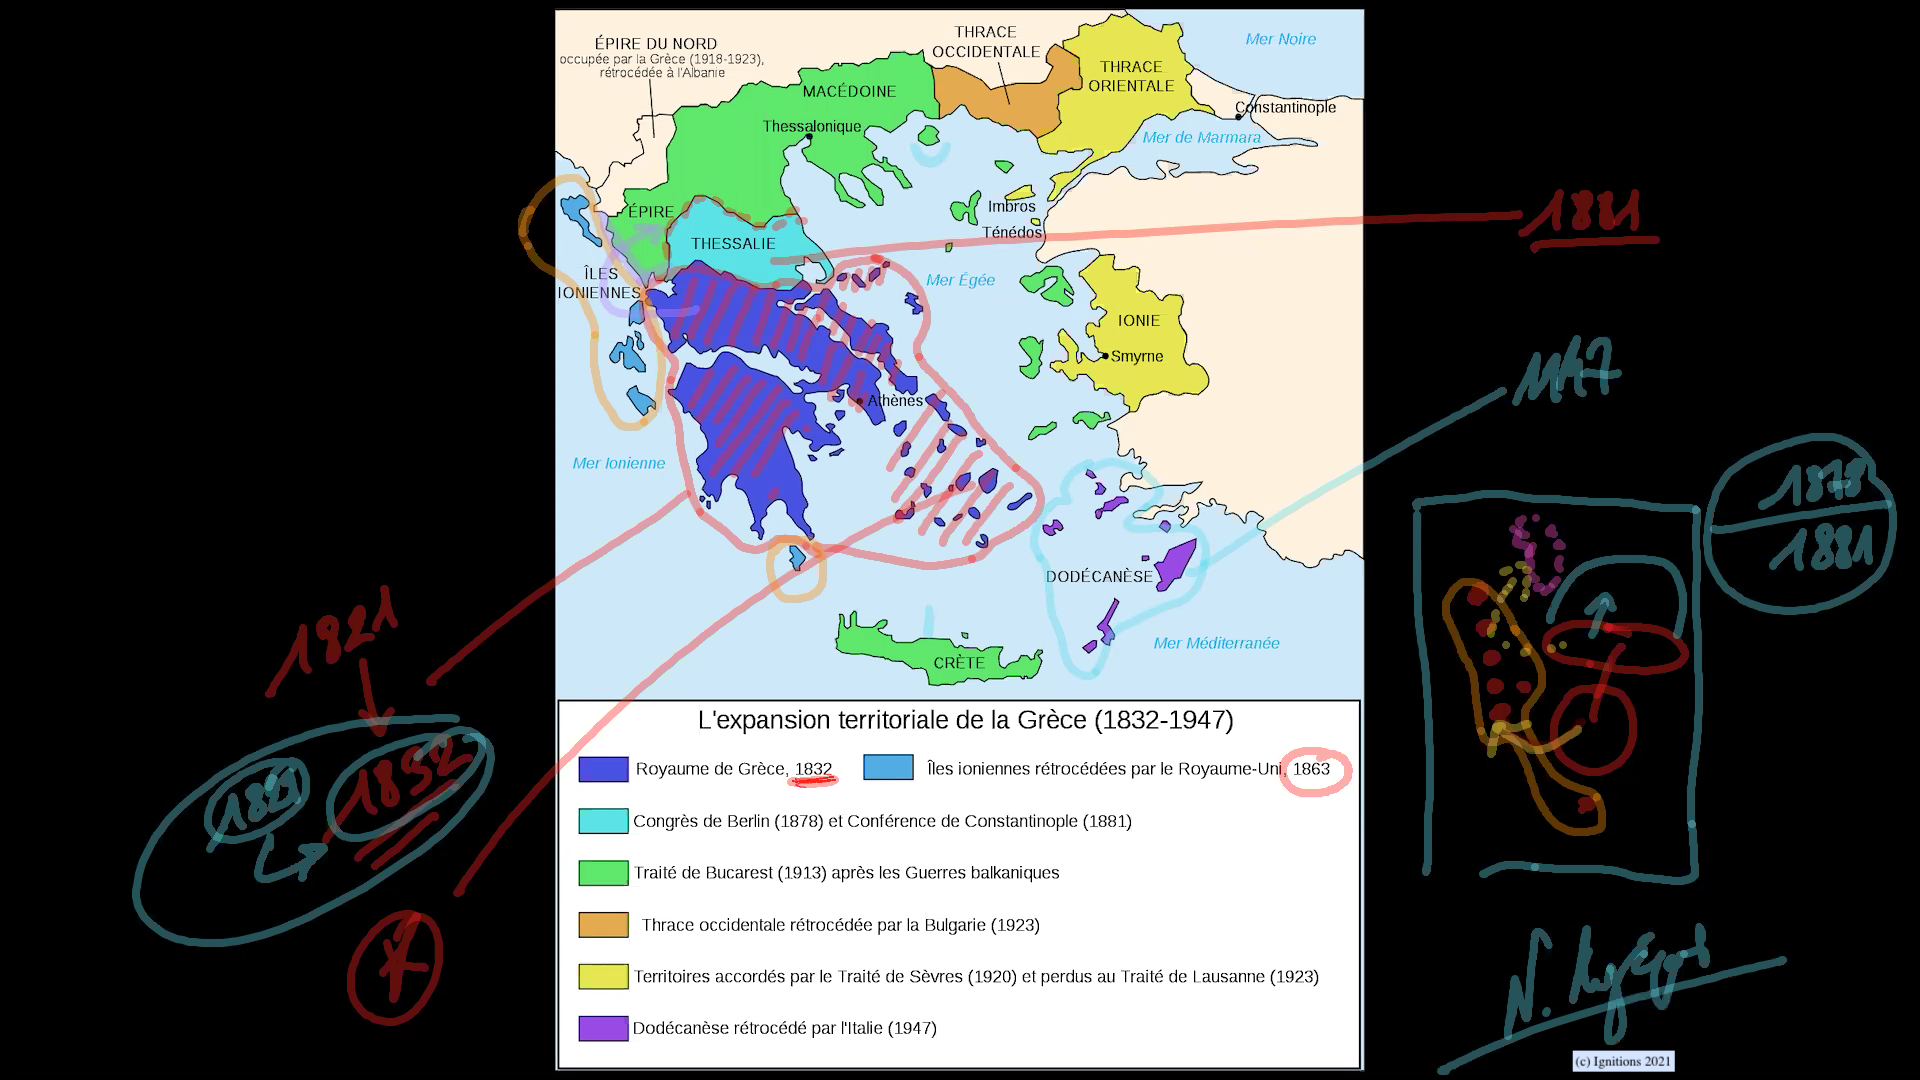 59089 - VII - Στρατηγική αναδίπλωση Ελλάδας και χρονικές γέφυρες. Επανάσταση IV. (Dessin)